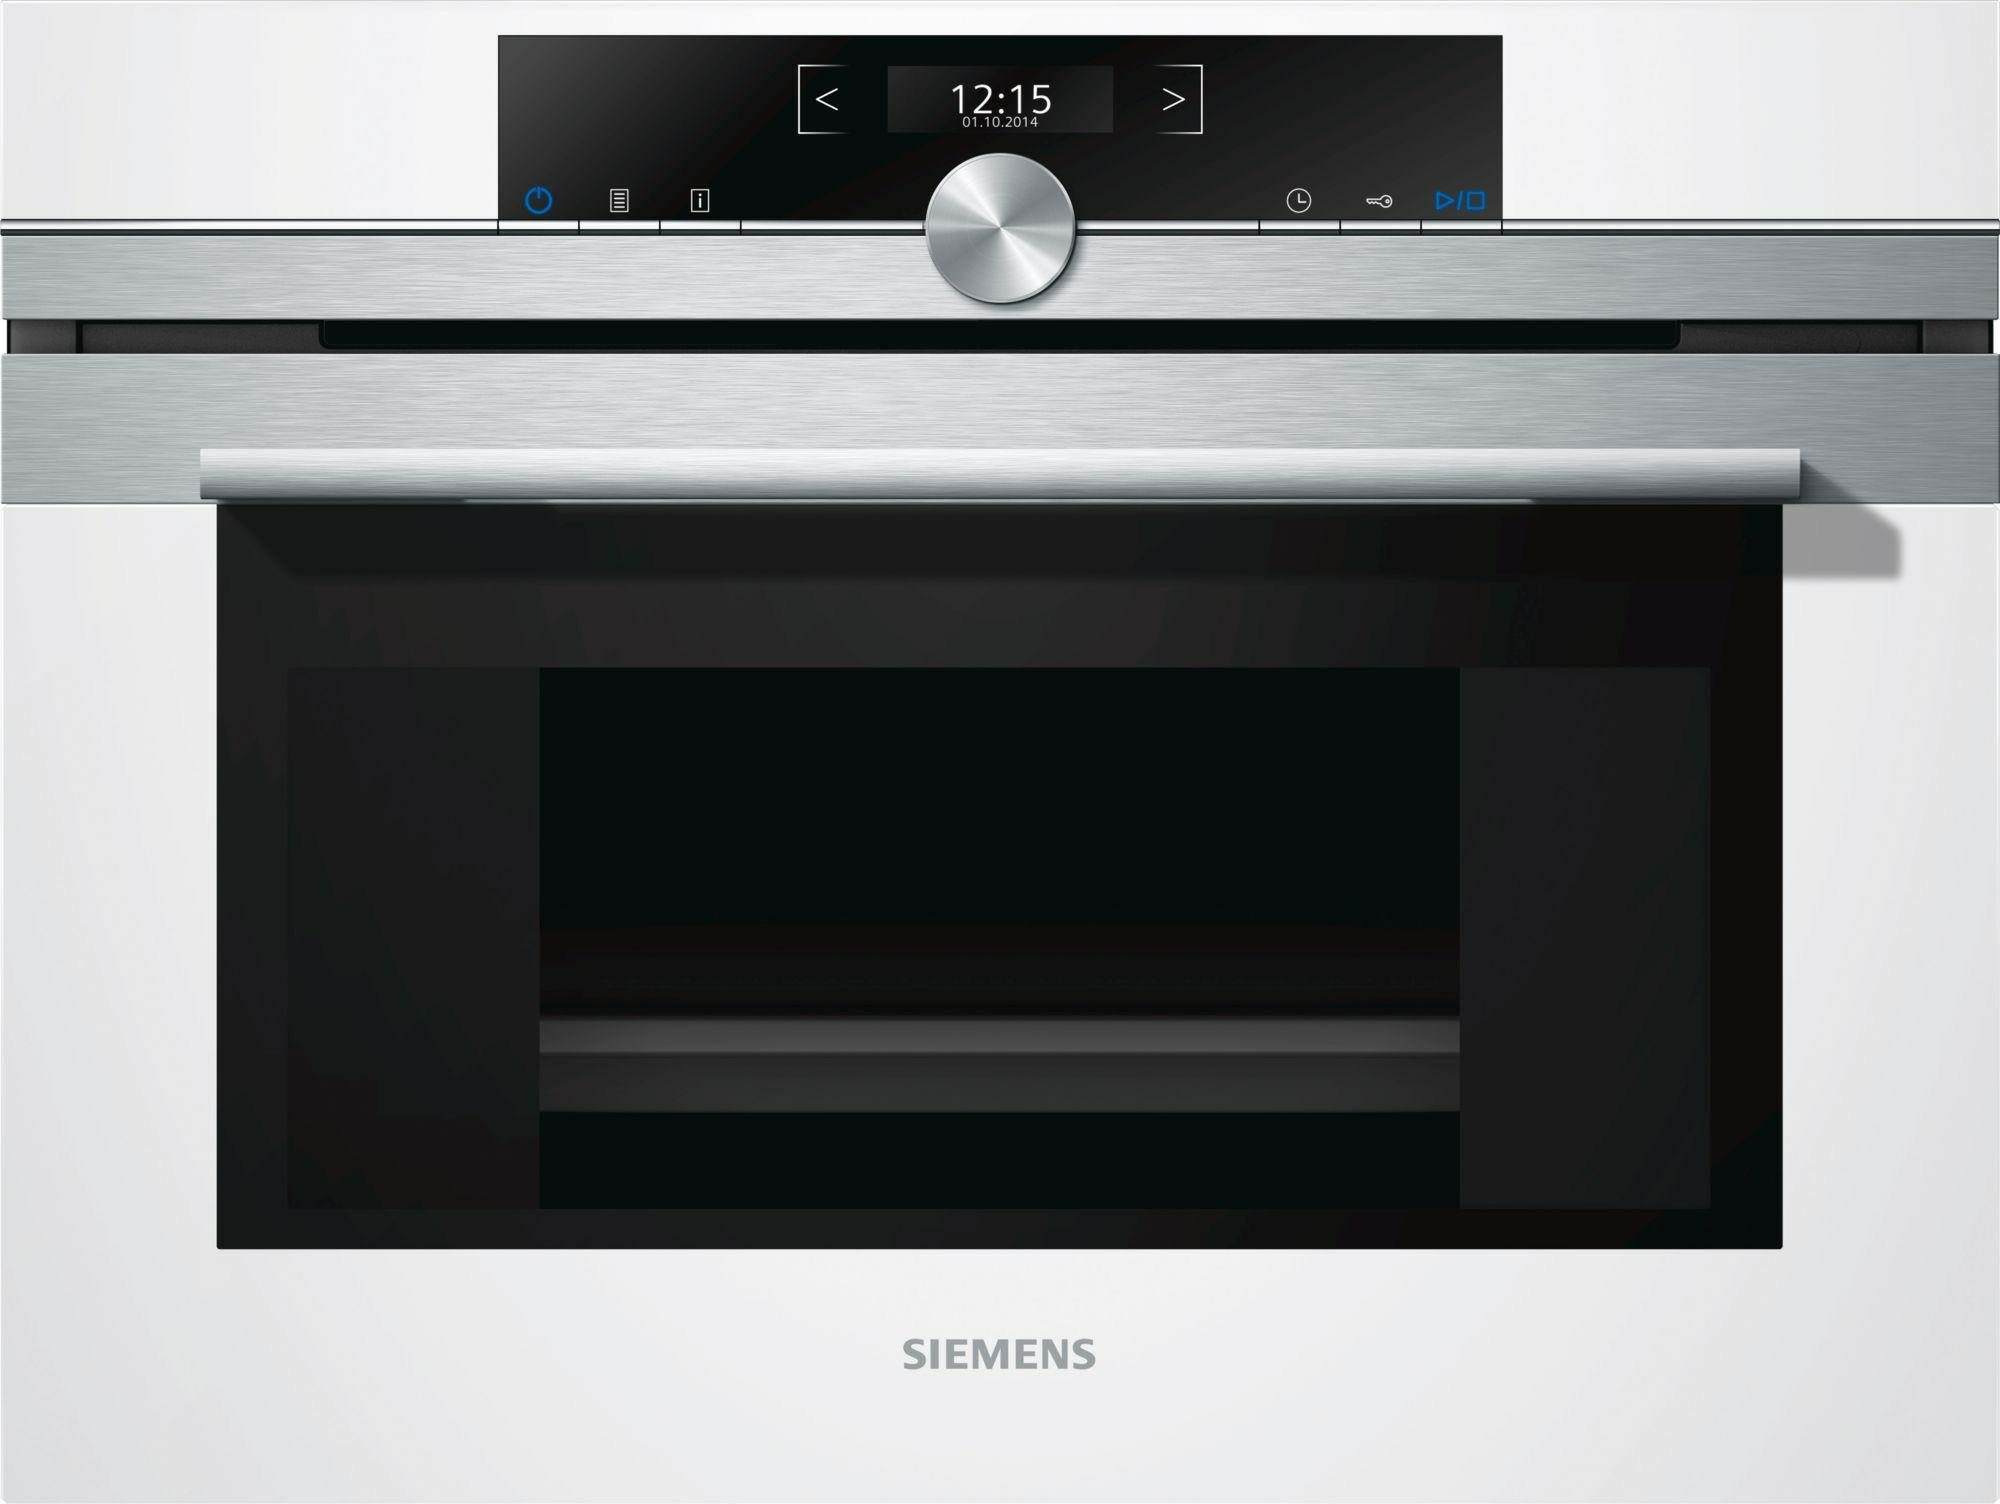 oven stoom Siemens CD634GBW1 oven stoom CD 634GBW1 CD 634 GBW 1